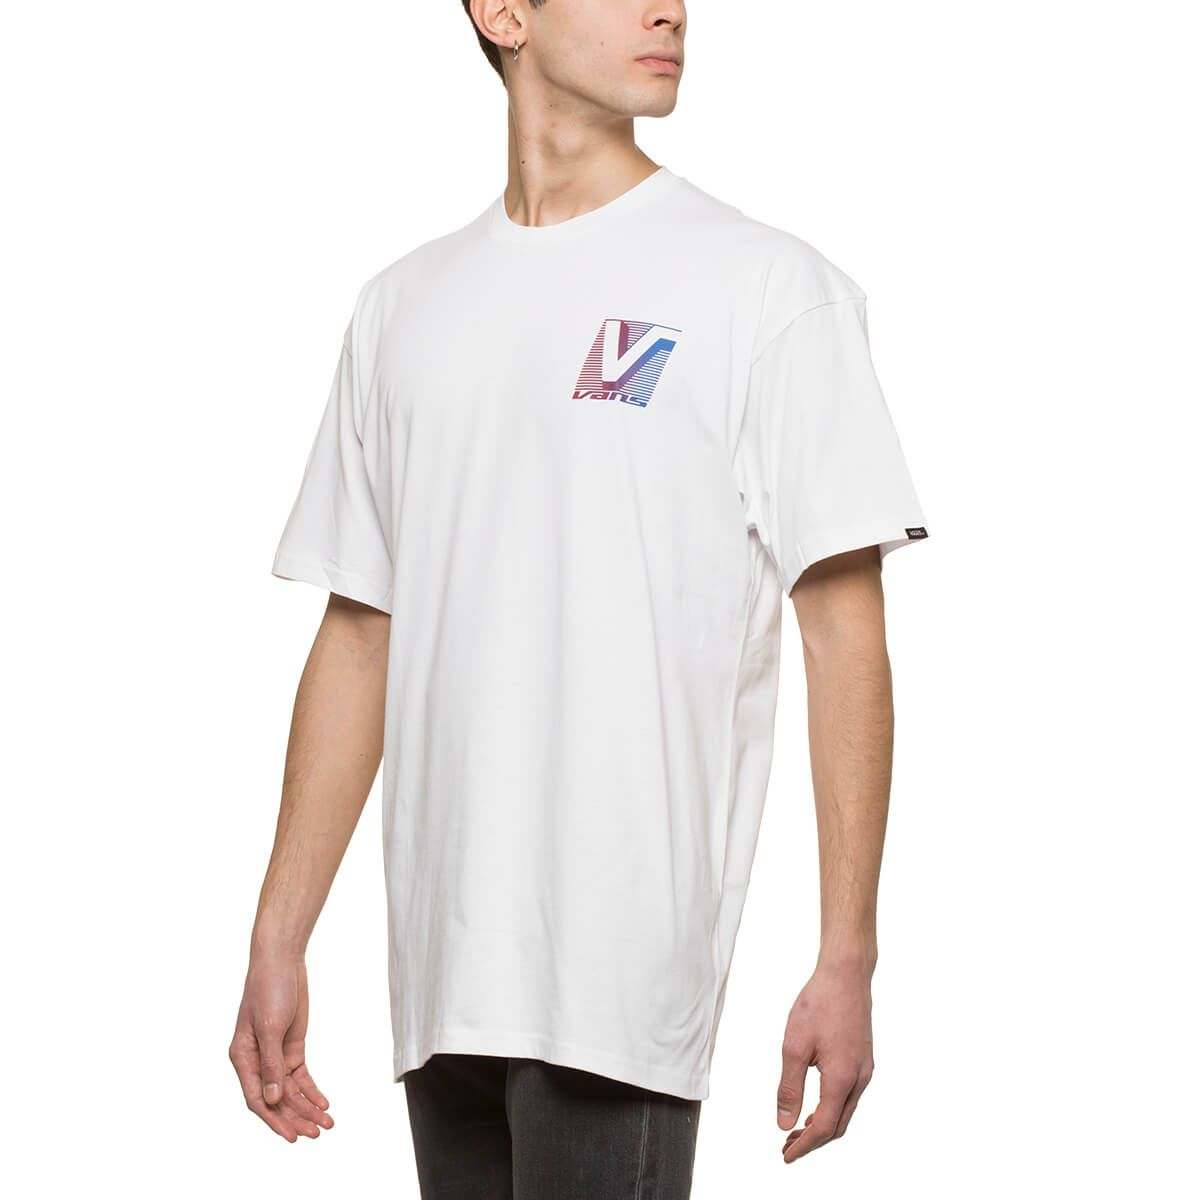 de29f487745b61 Vans Mn Grand T-shirt - White - 10596495